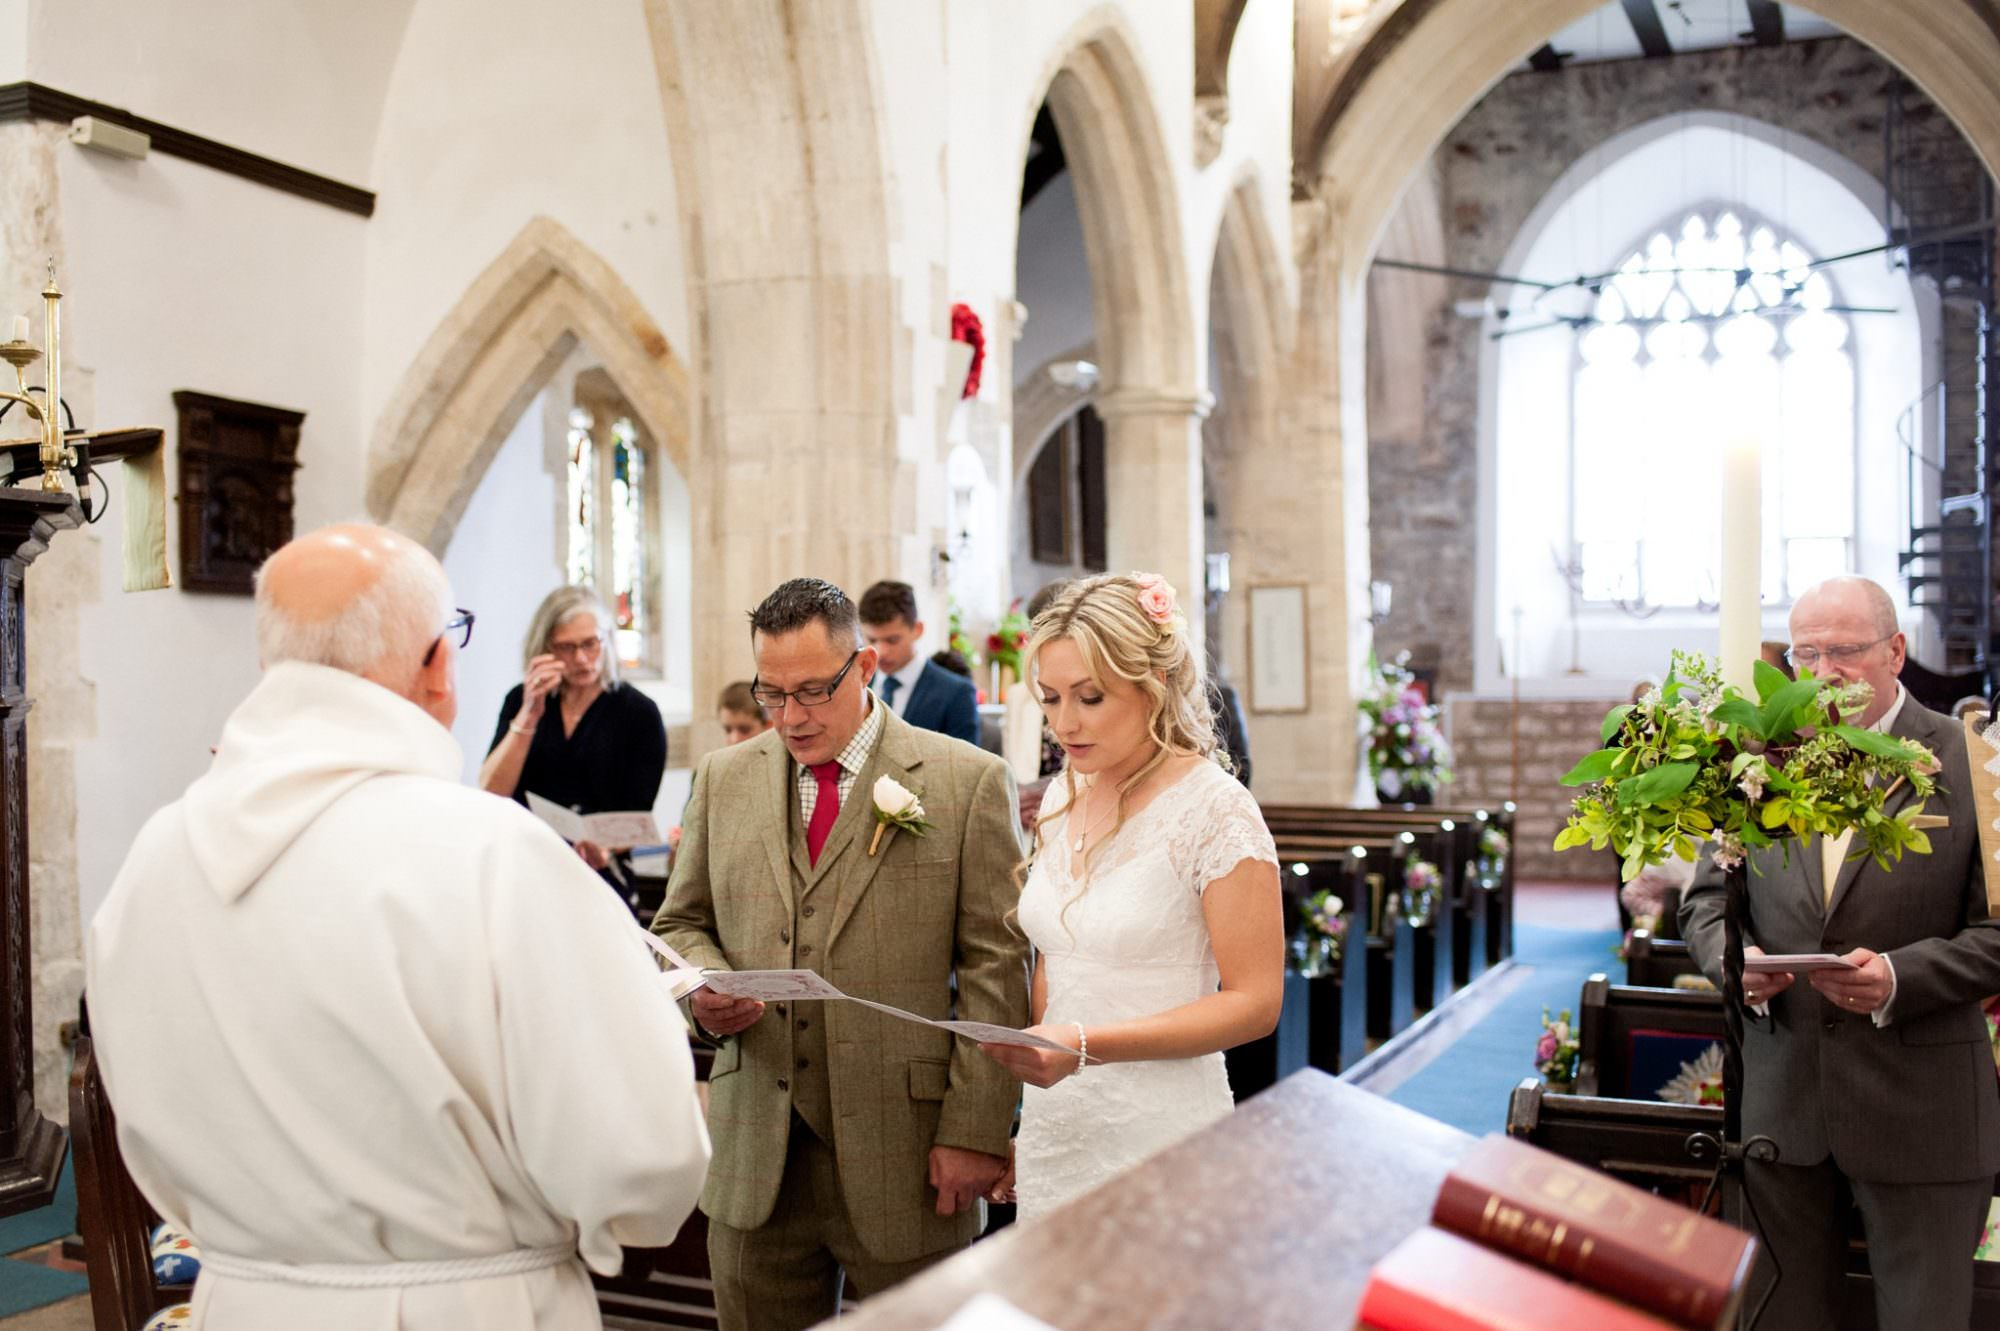 Wedding Ceremony at Sopley Church in Dorset